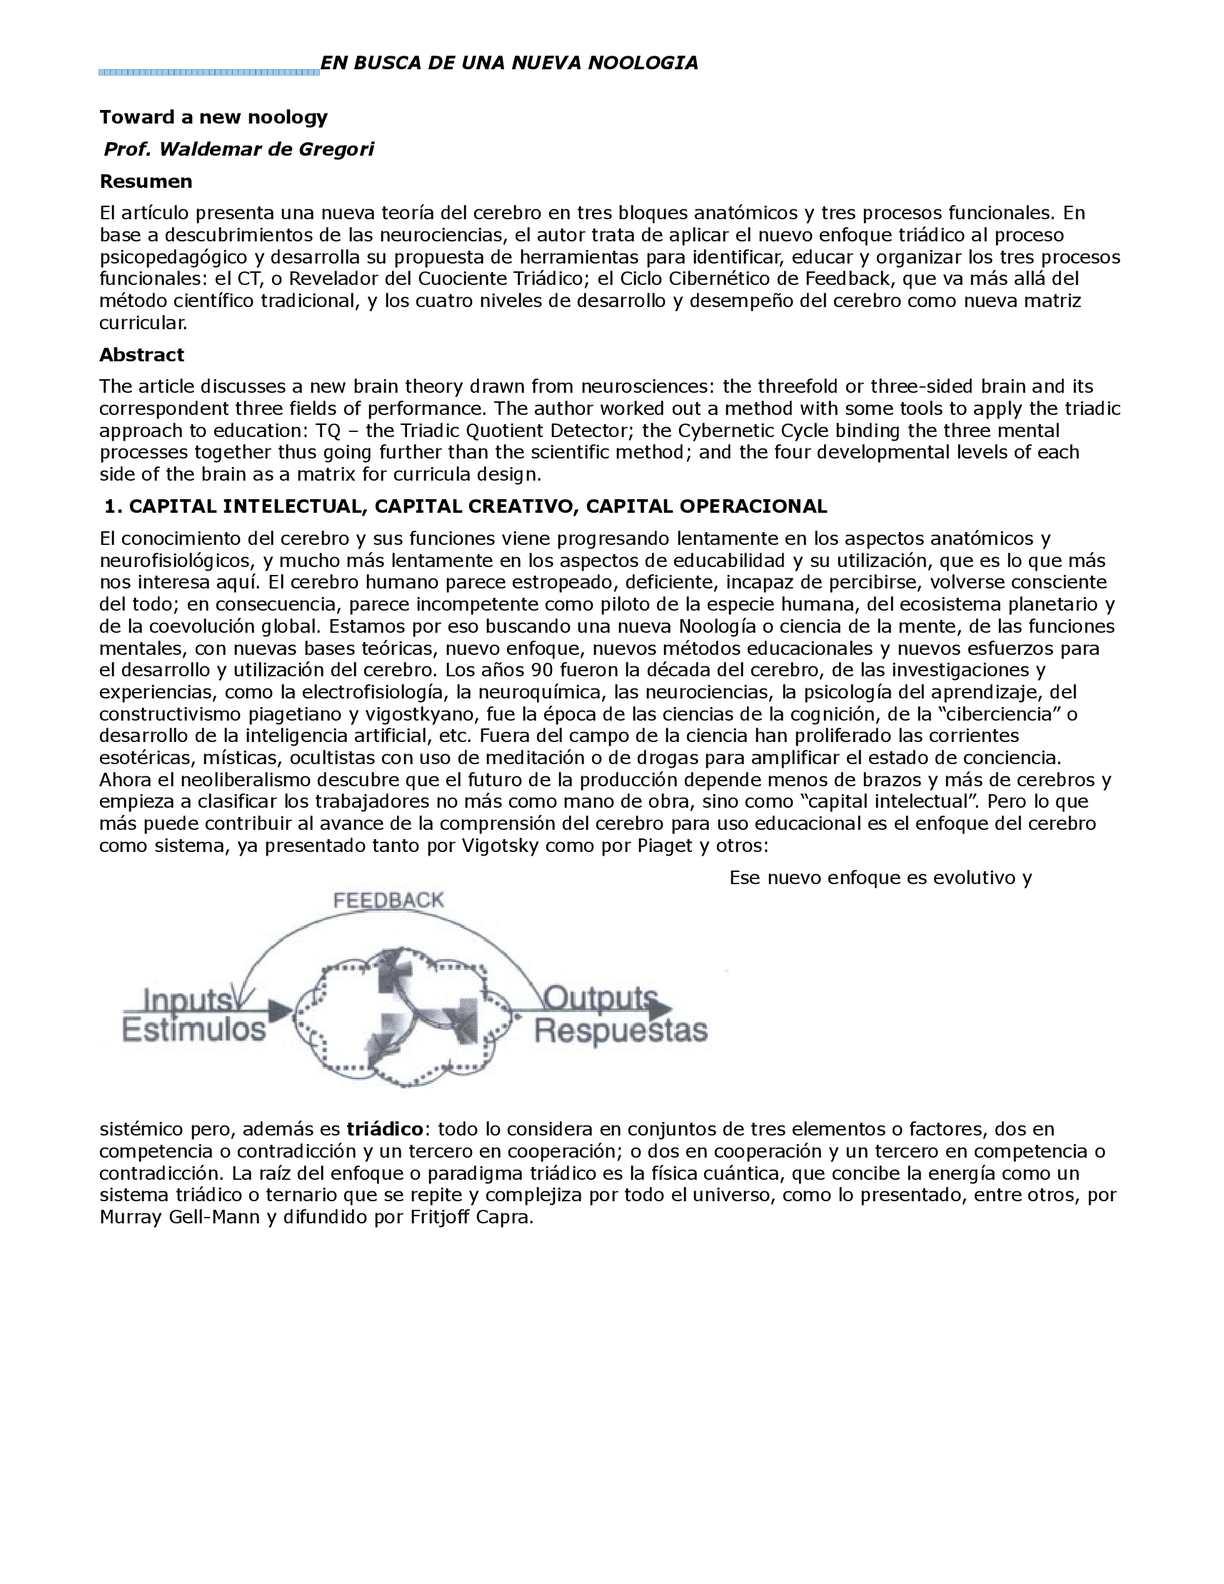 ESTILOS DE APRENDIZAJE SEGUN WALDEMAR DE GREGORI